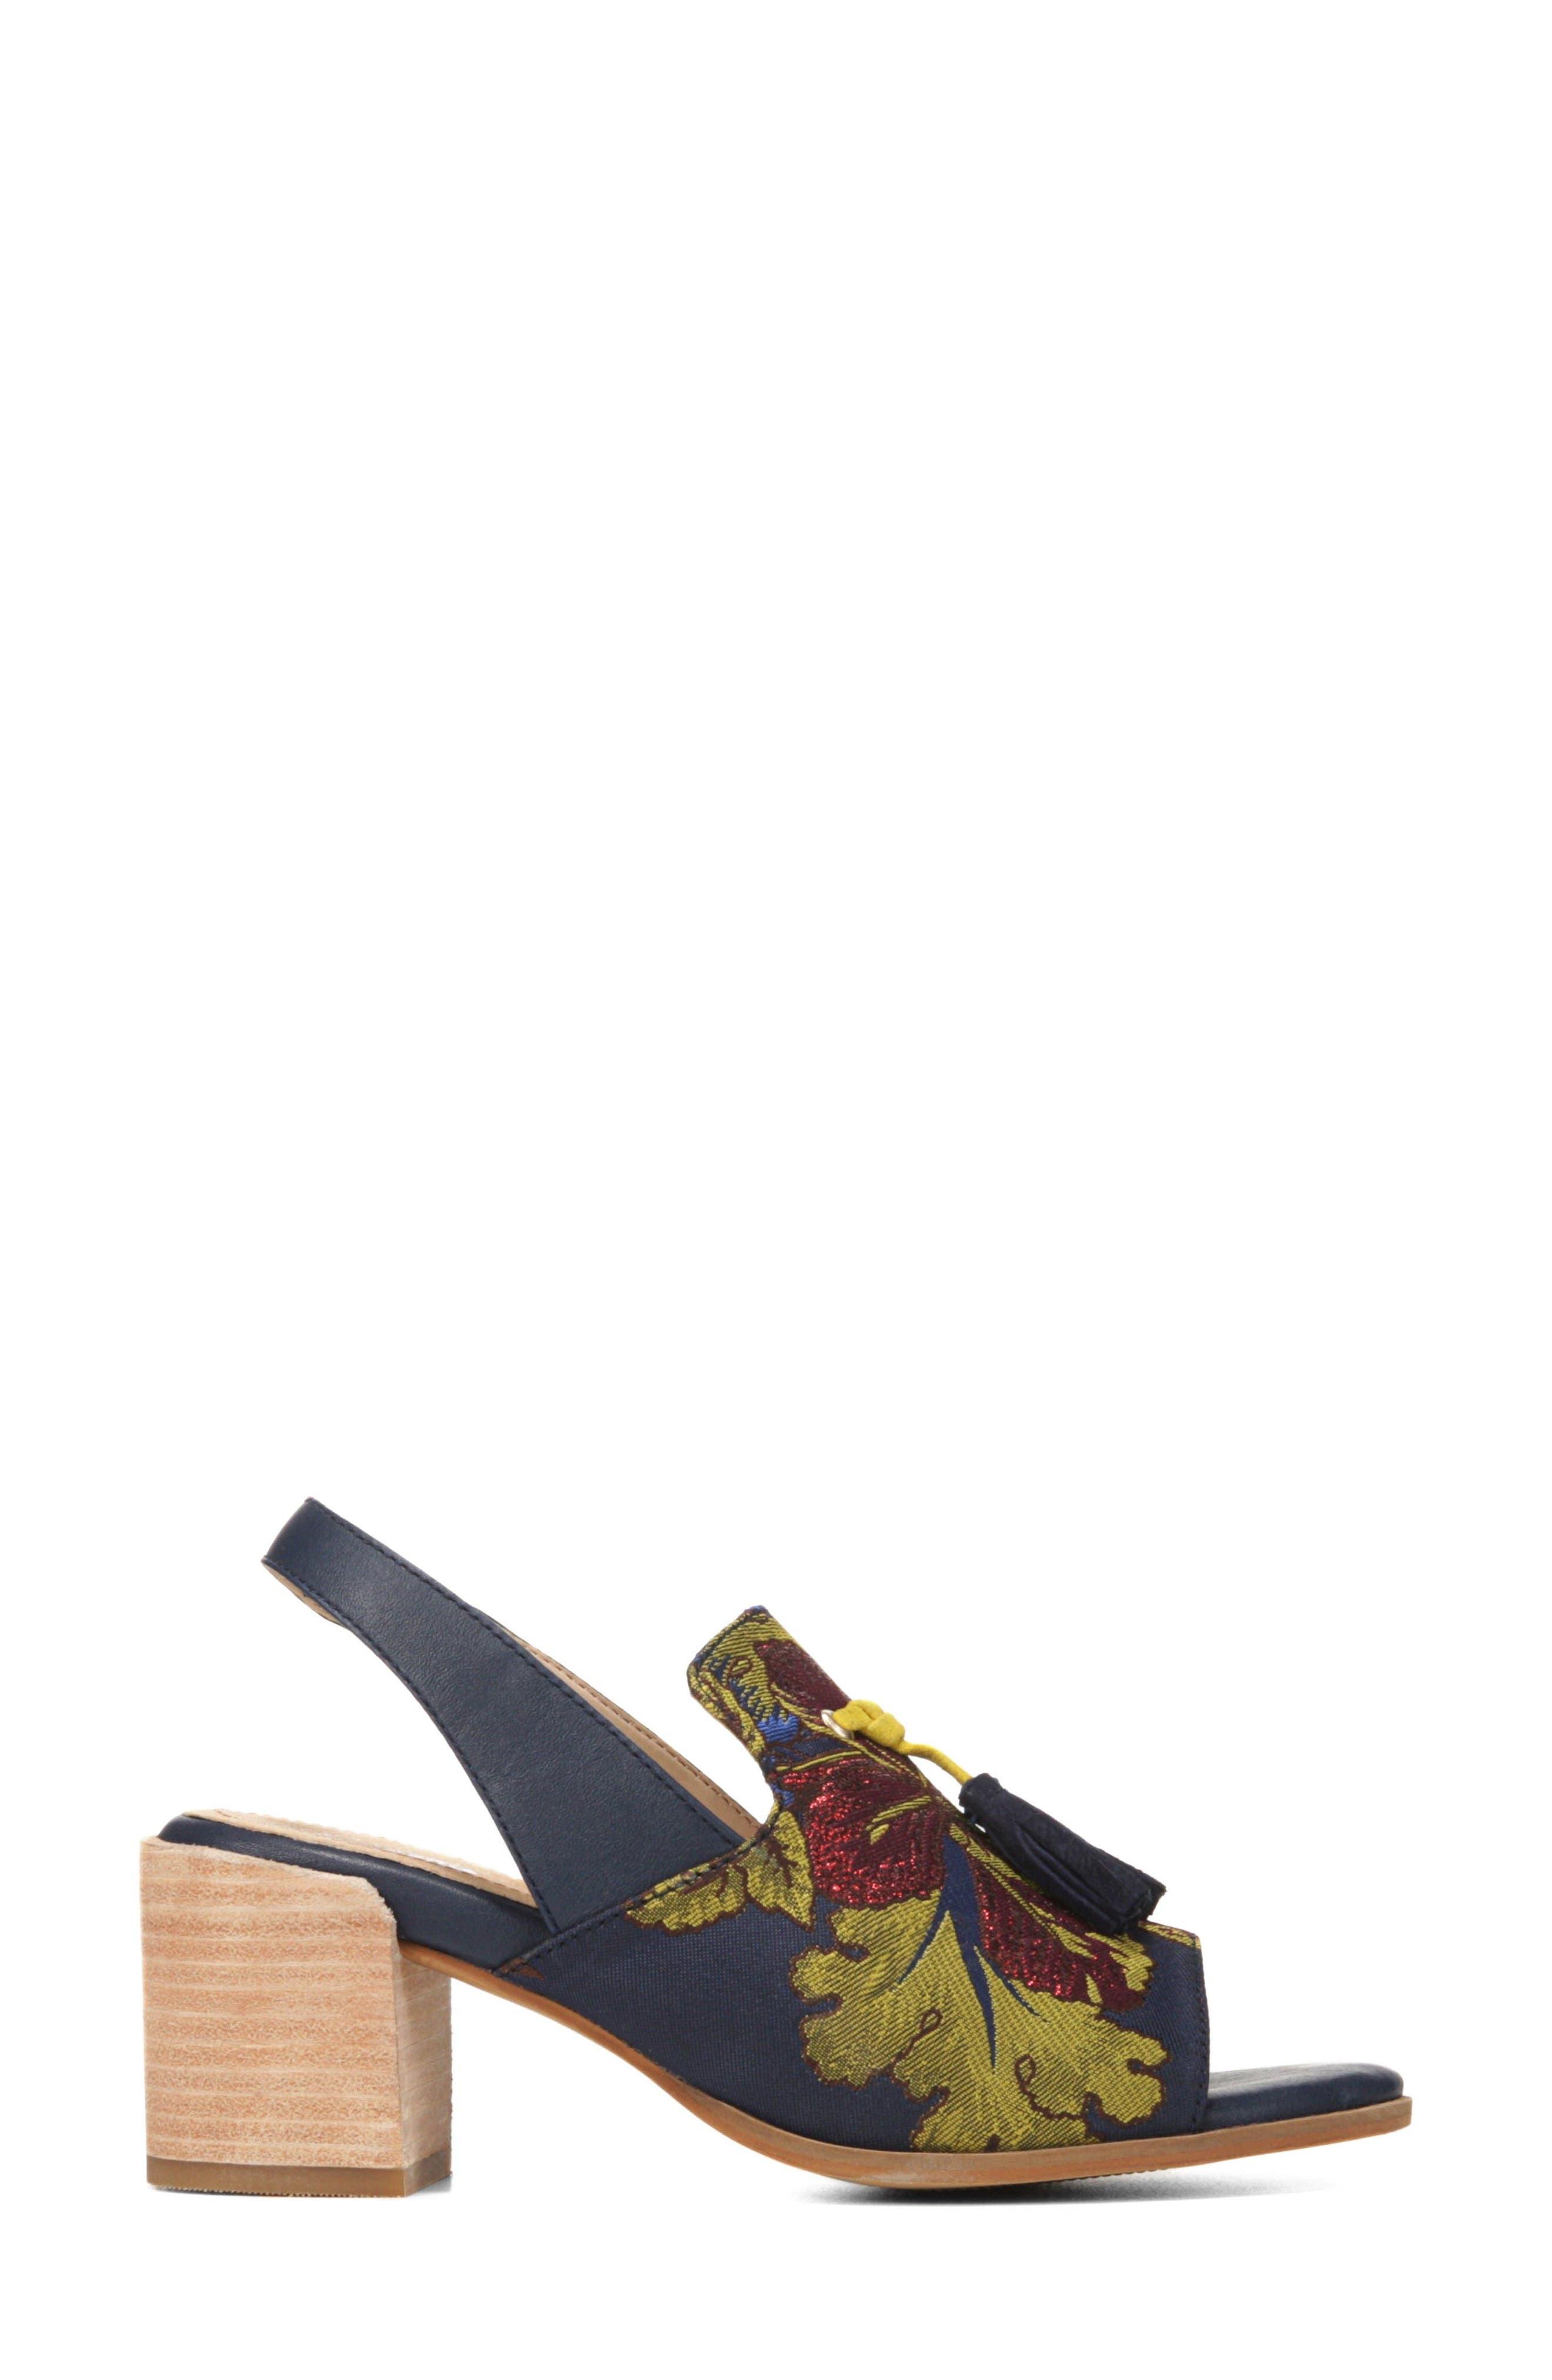 Meko Slingback Sandal,                             Alternate thumbnail 3, color,                             400